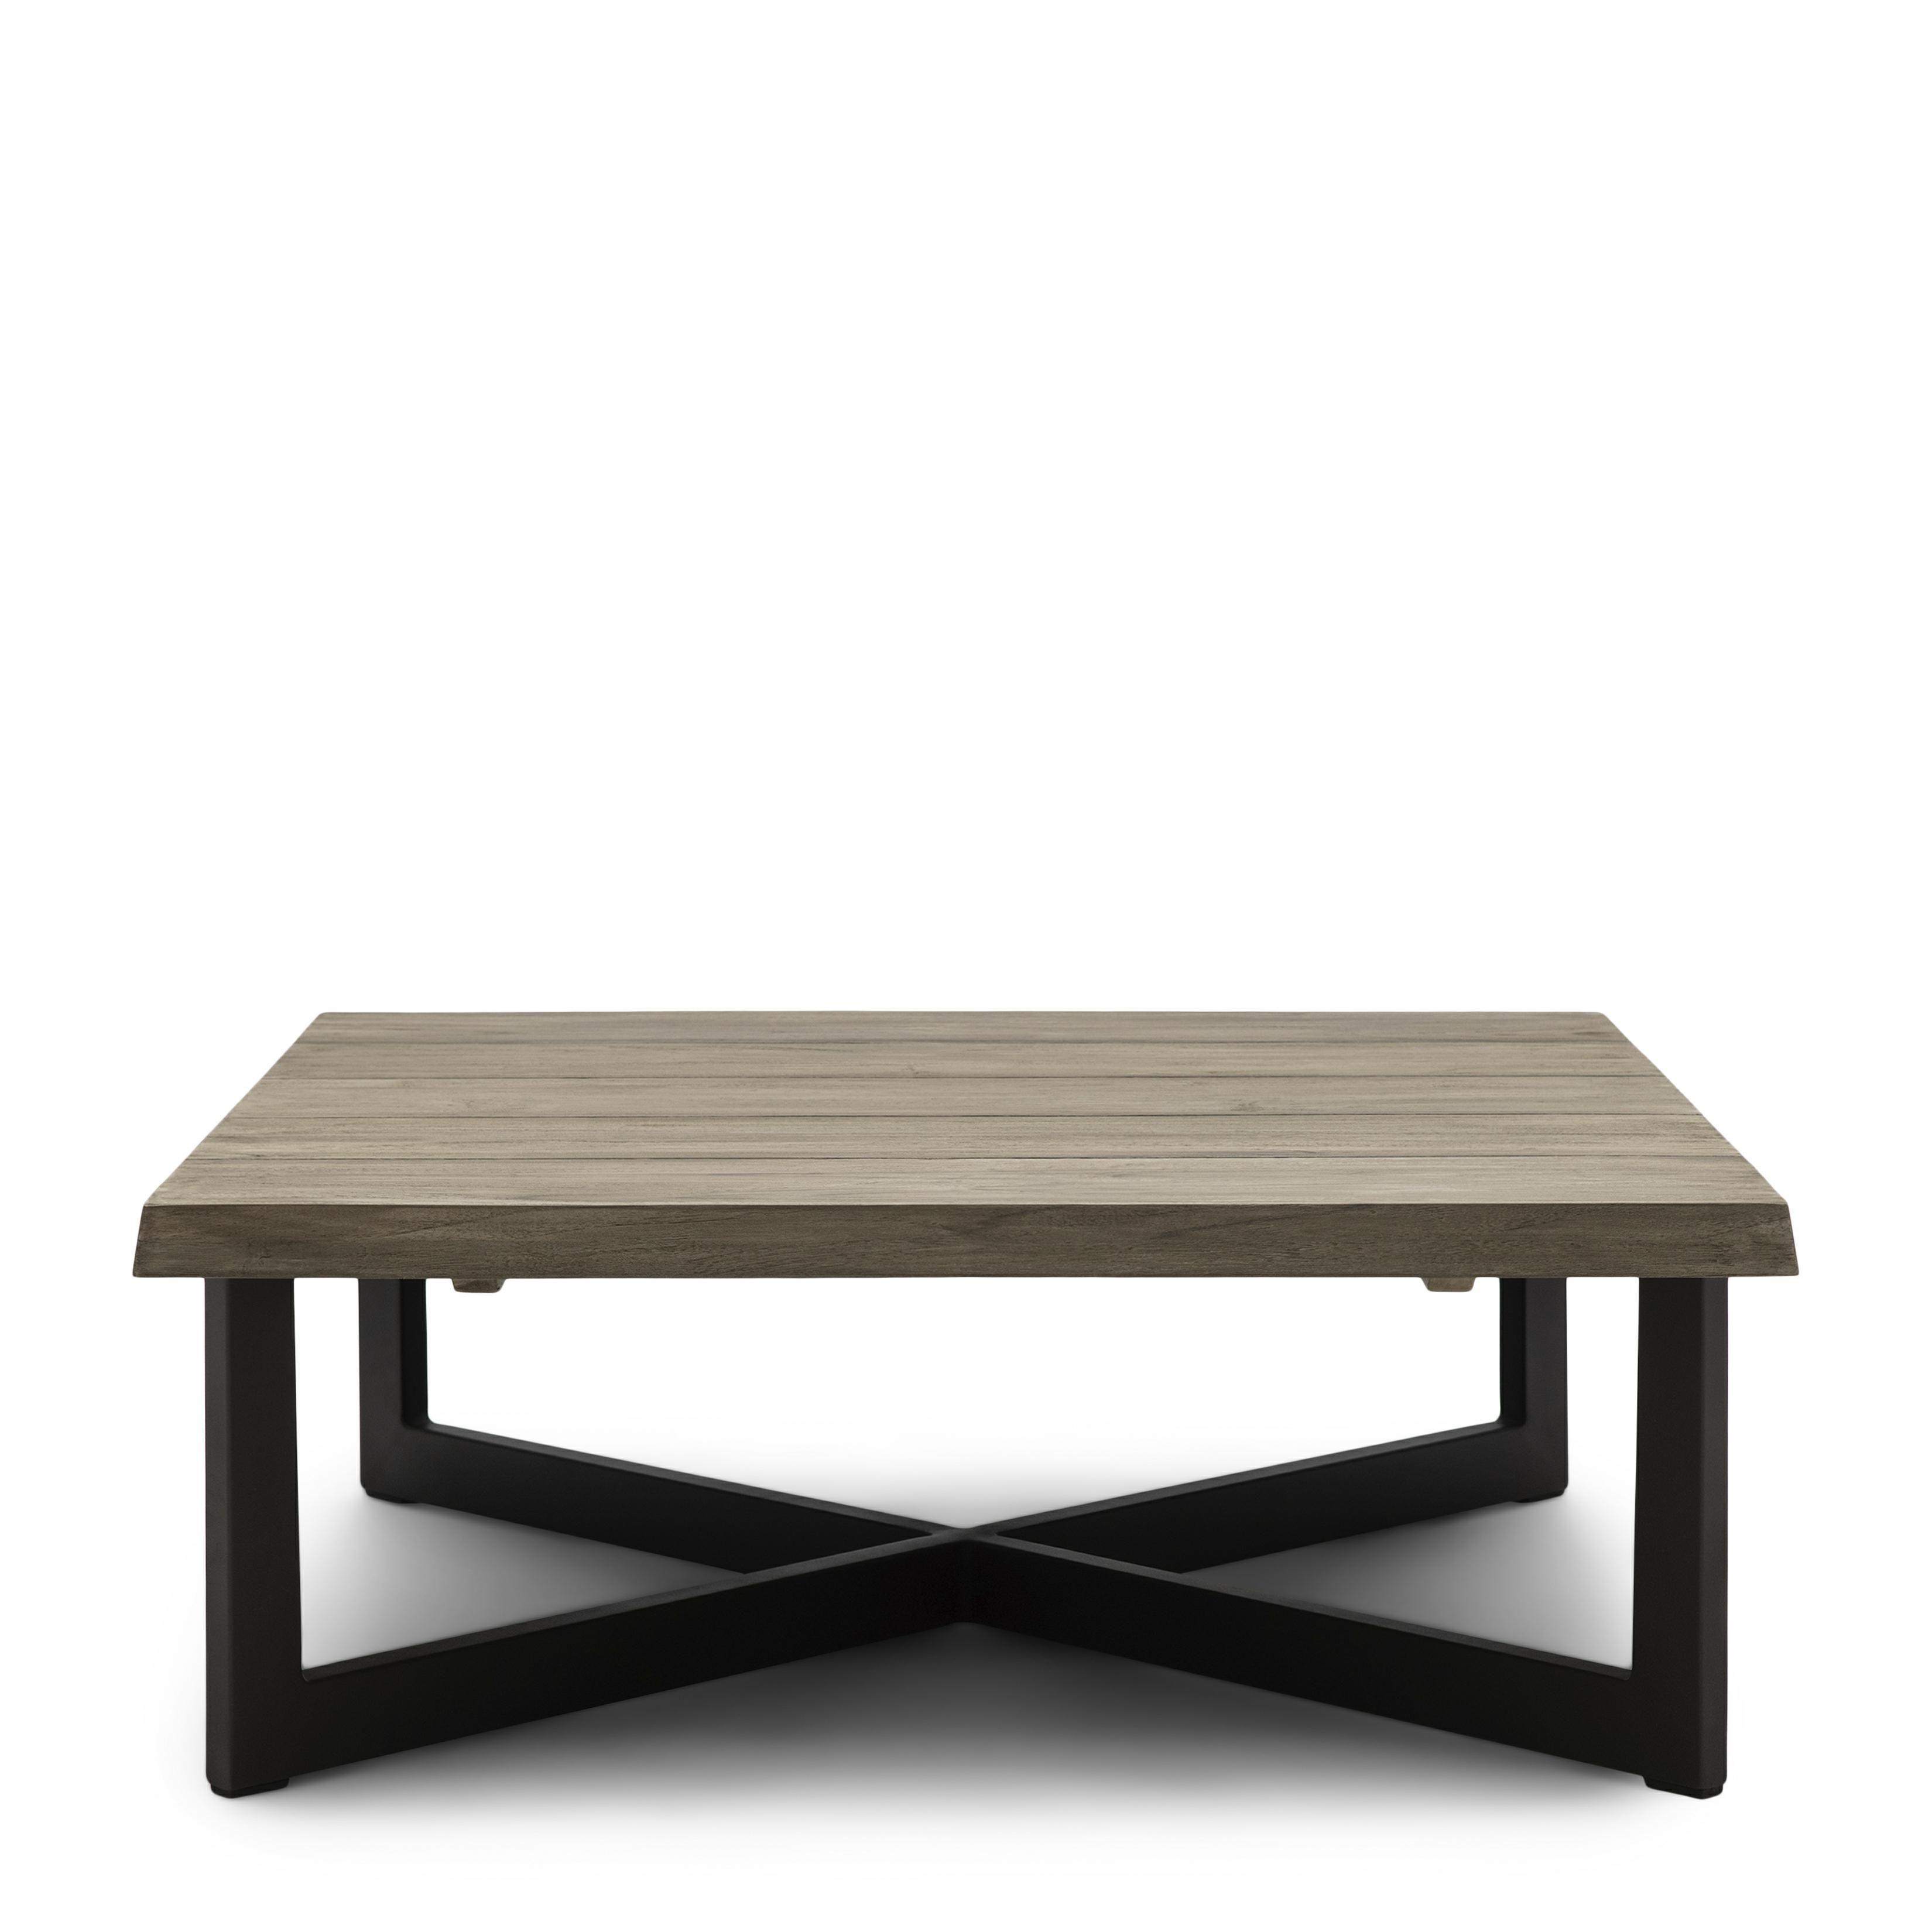 Bondi Beach Outdoor Coffee Table Grey / Rivièra Maison